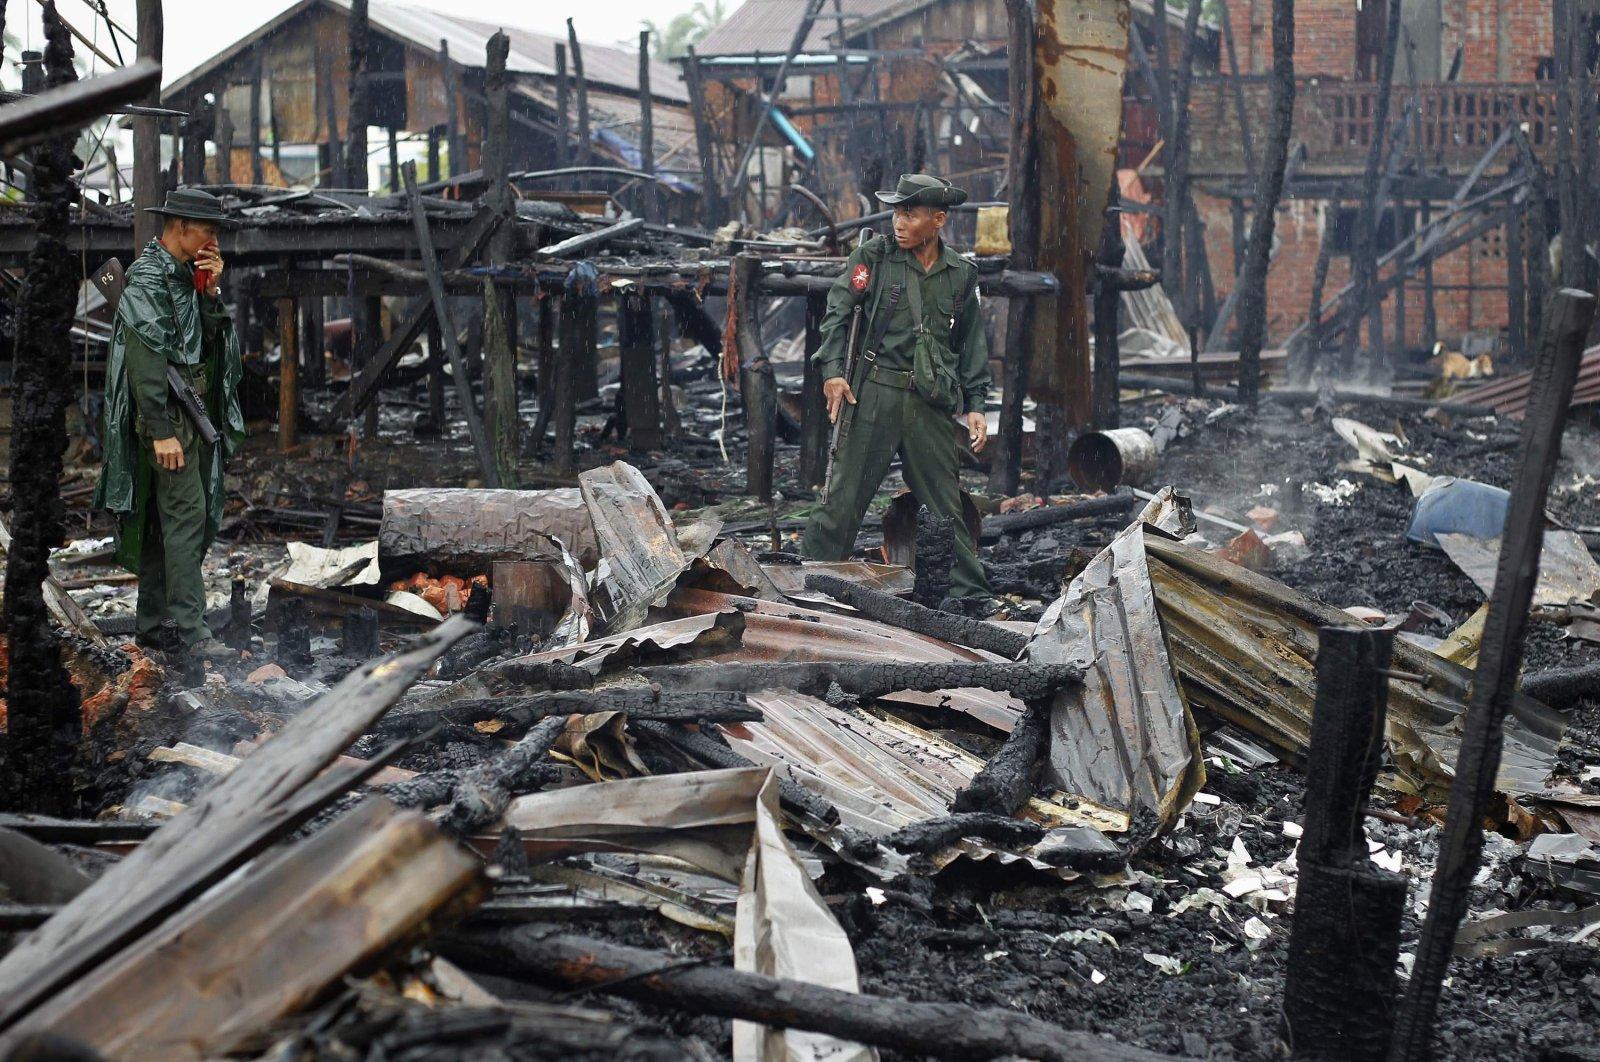 Soldiers patrol through a neighborhood burned in recent violence, Sittwe June 15, 2012. (REUTERS Photo)